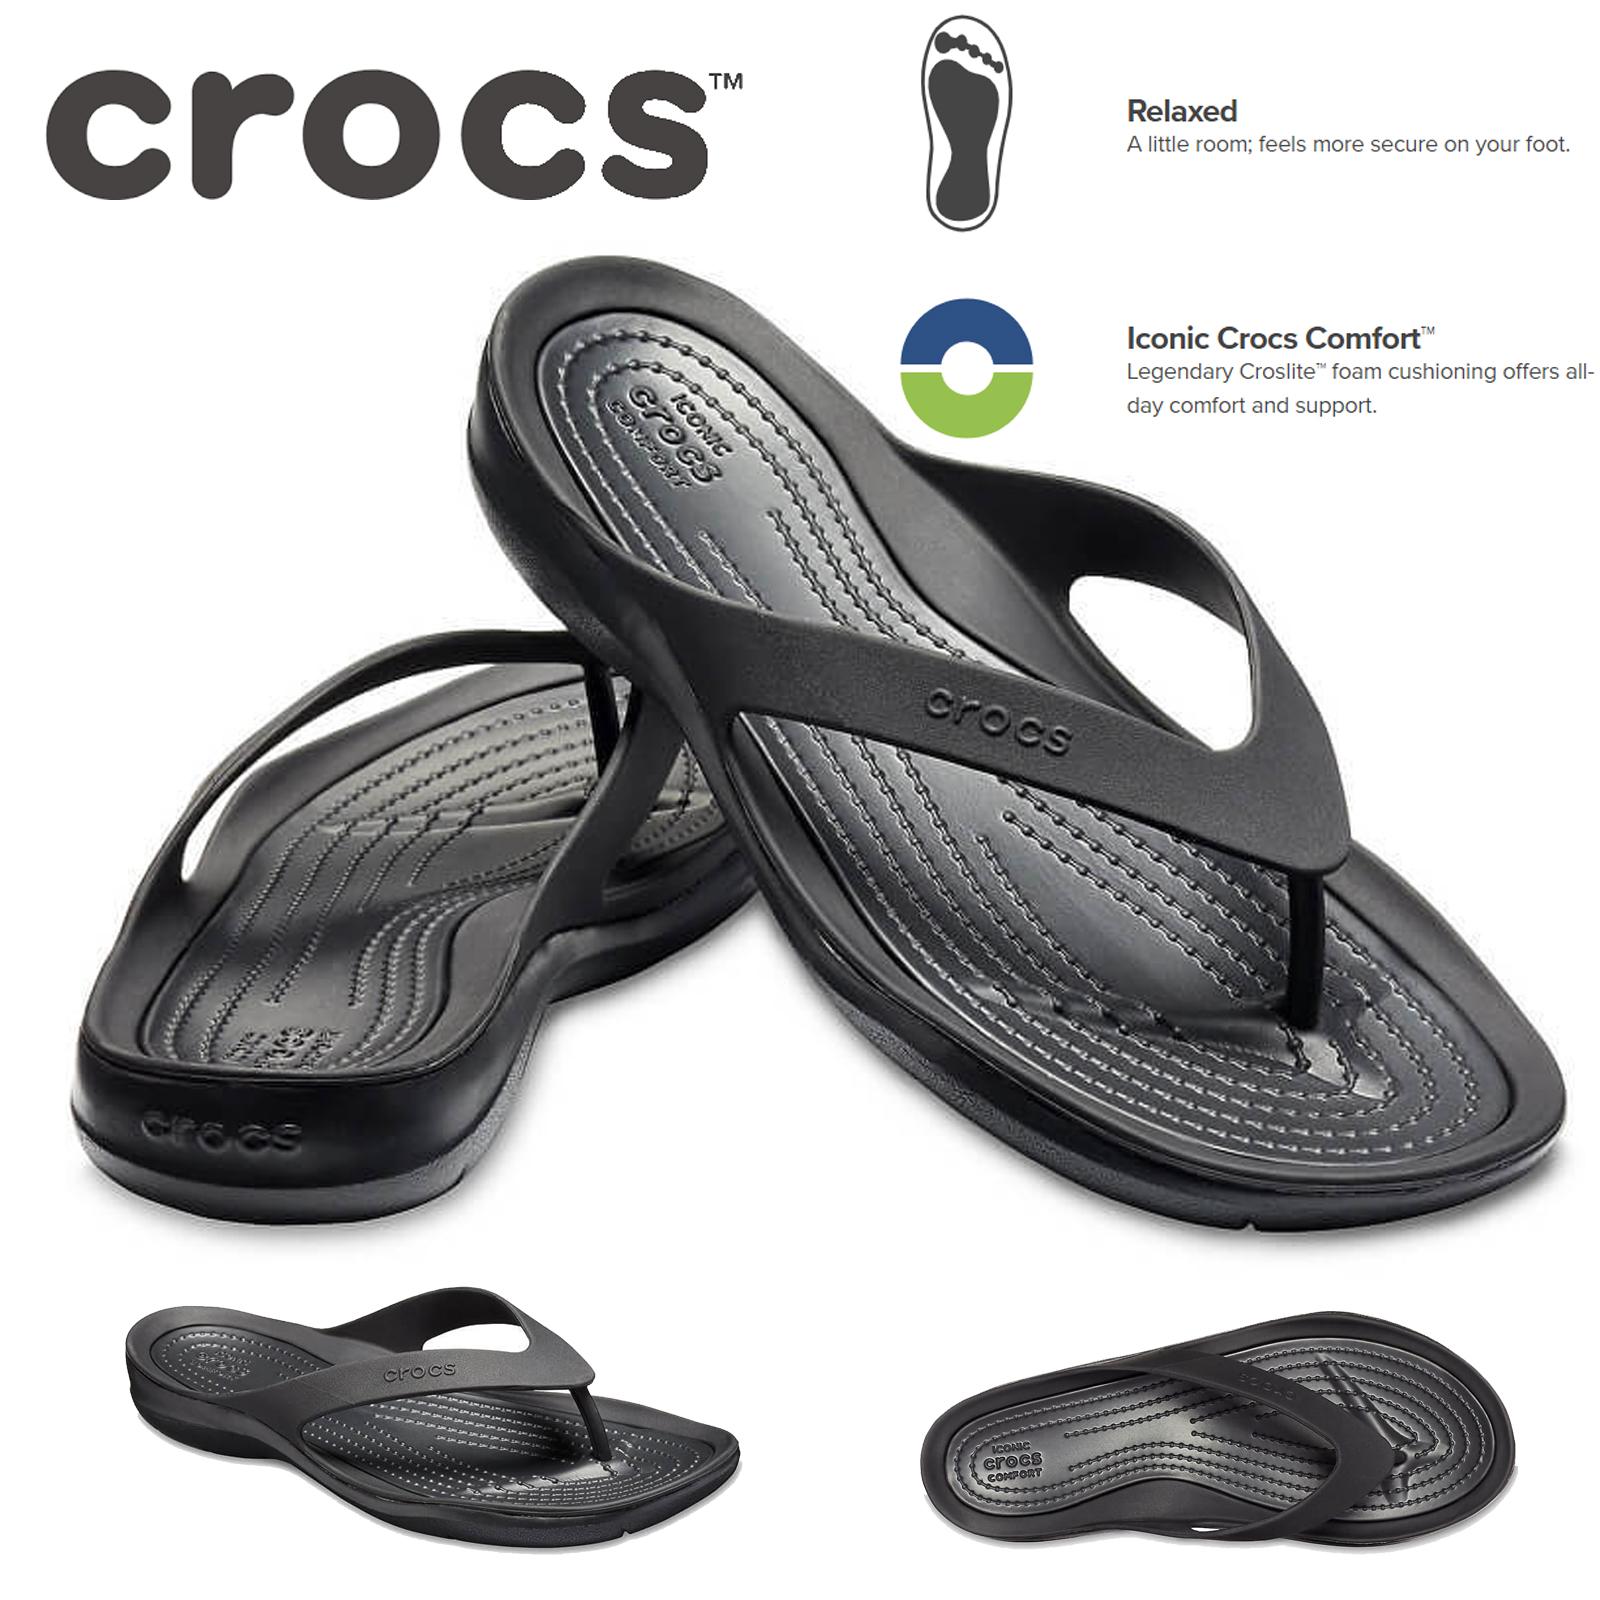 5d0de6e7c1c2 Crocs Women s Swiftwater Flip Flops Thongs - Black Black